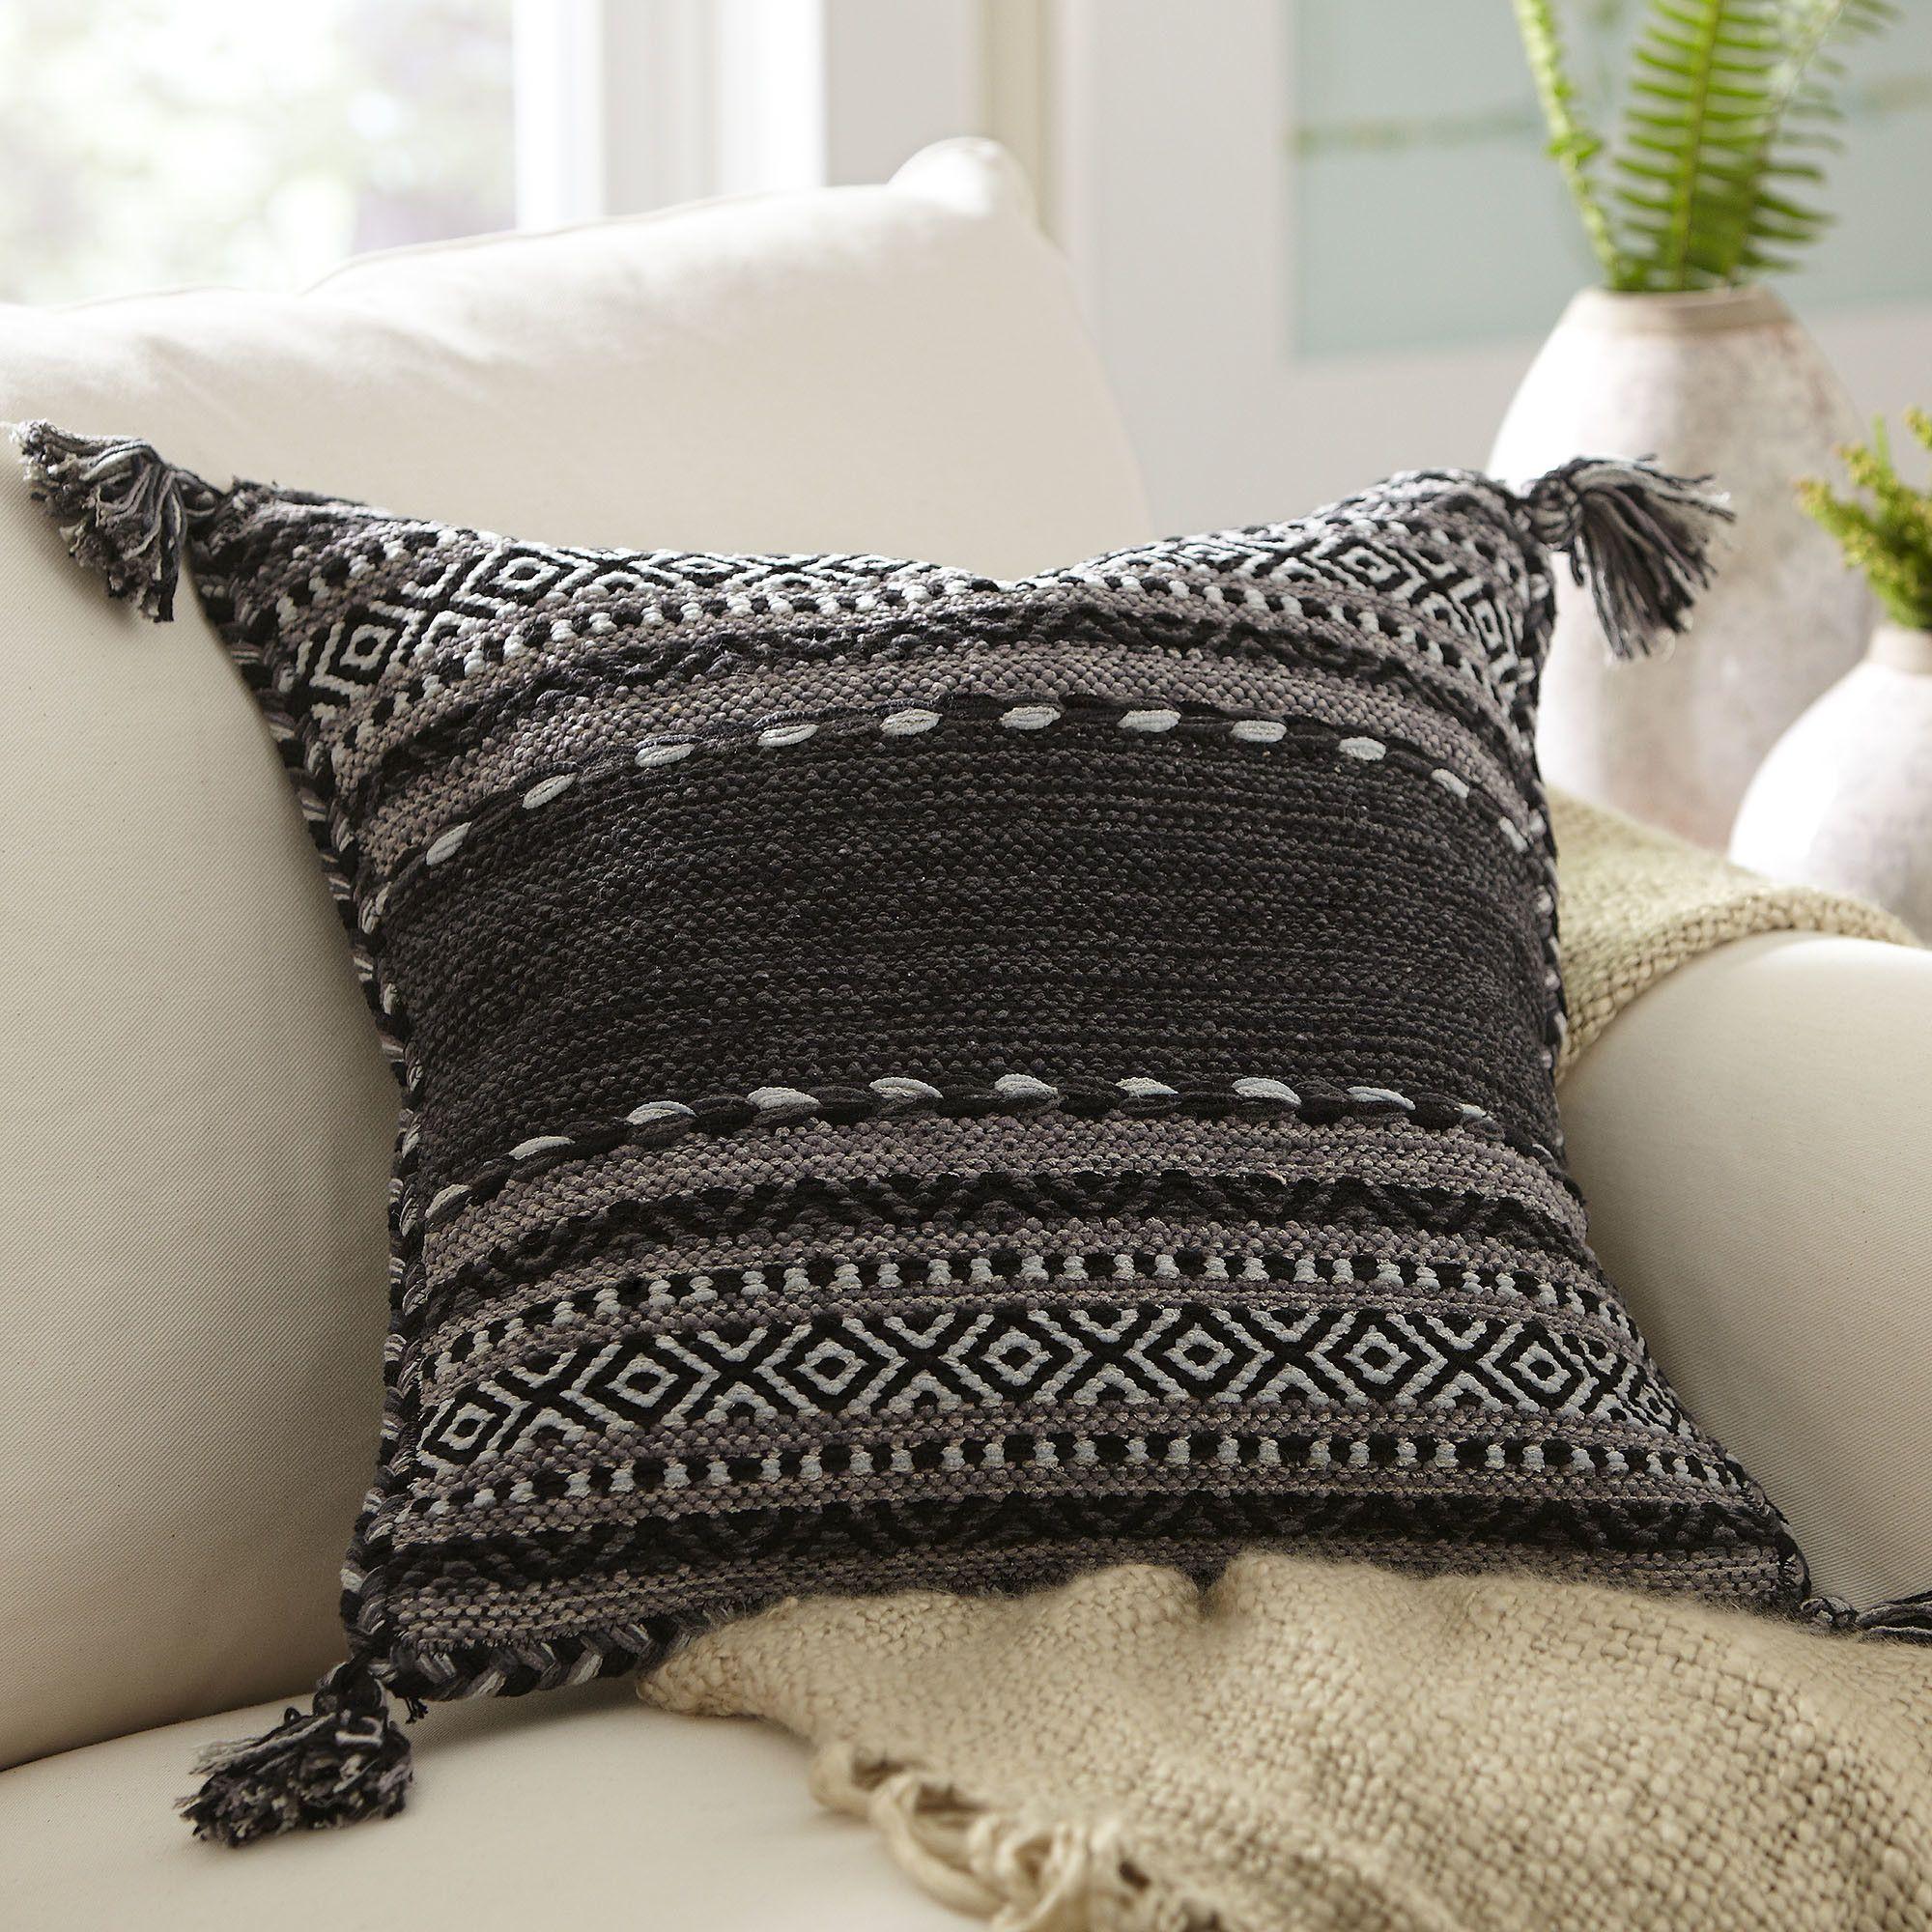 Super Birch Lane Fogarty Throw Pillow Reviews Wayfair Throw Inzonedesignstudio Interior Chair Design Inzonedesignstudiocom